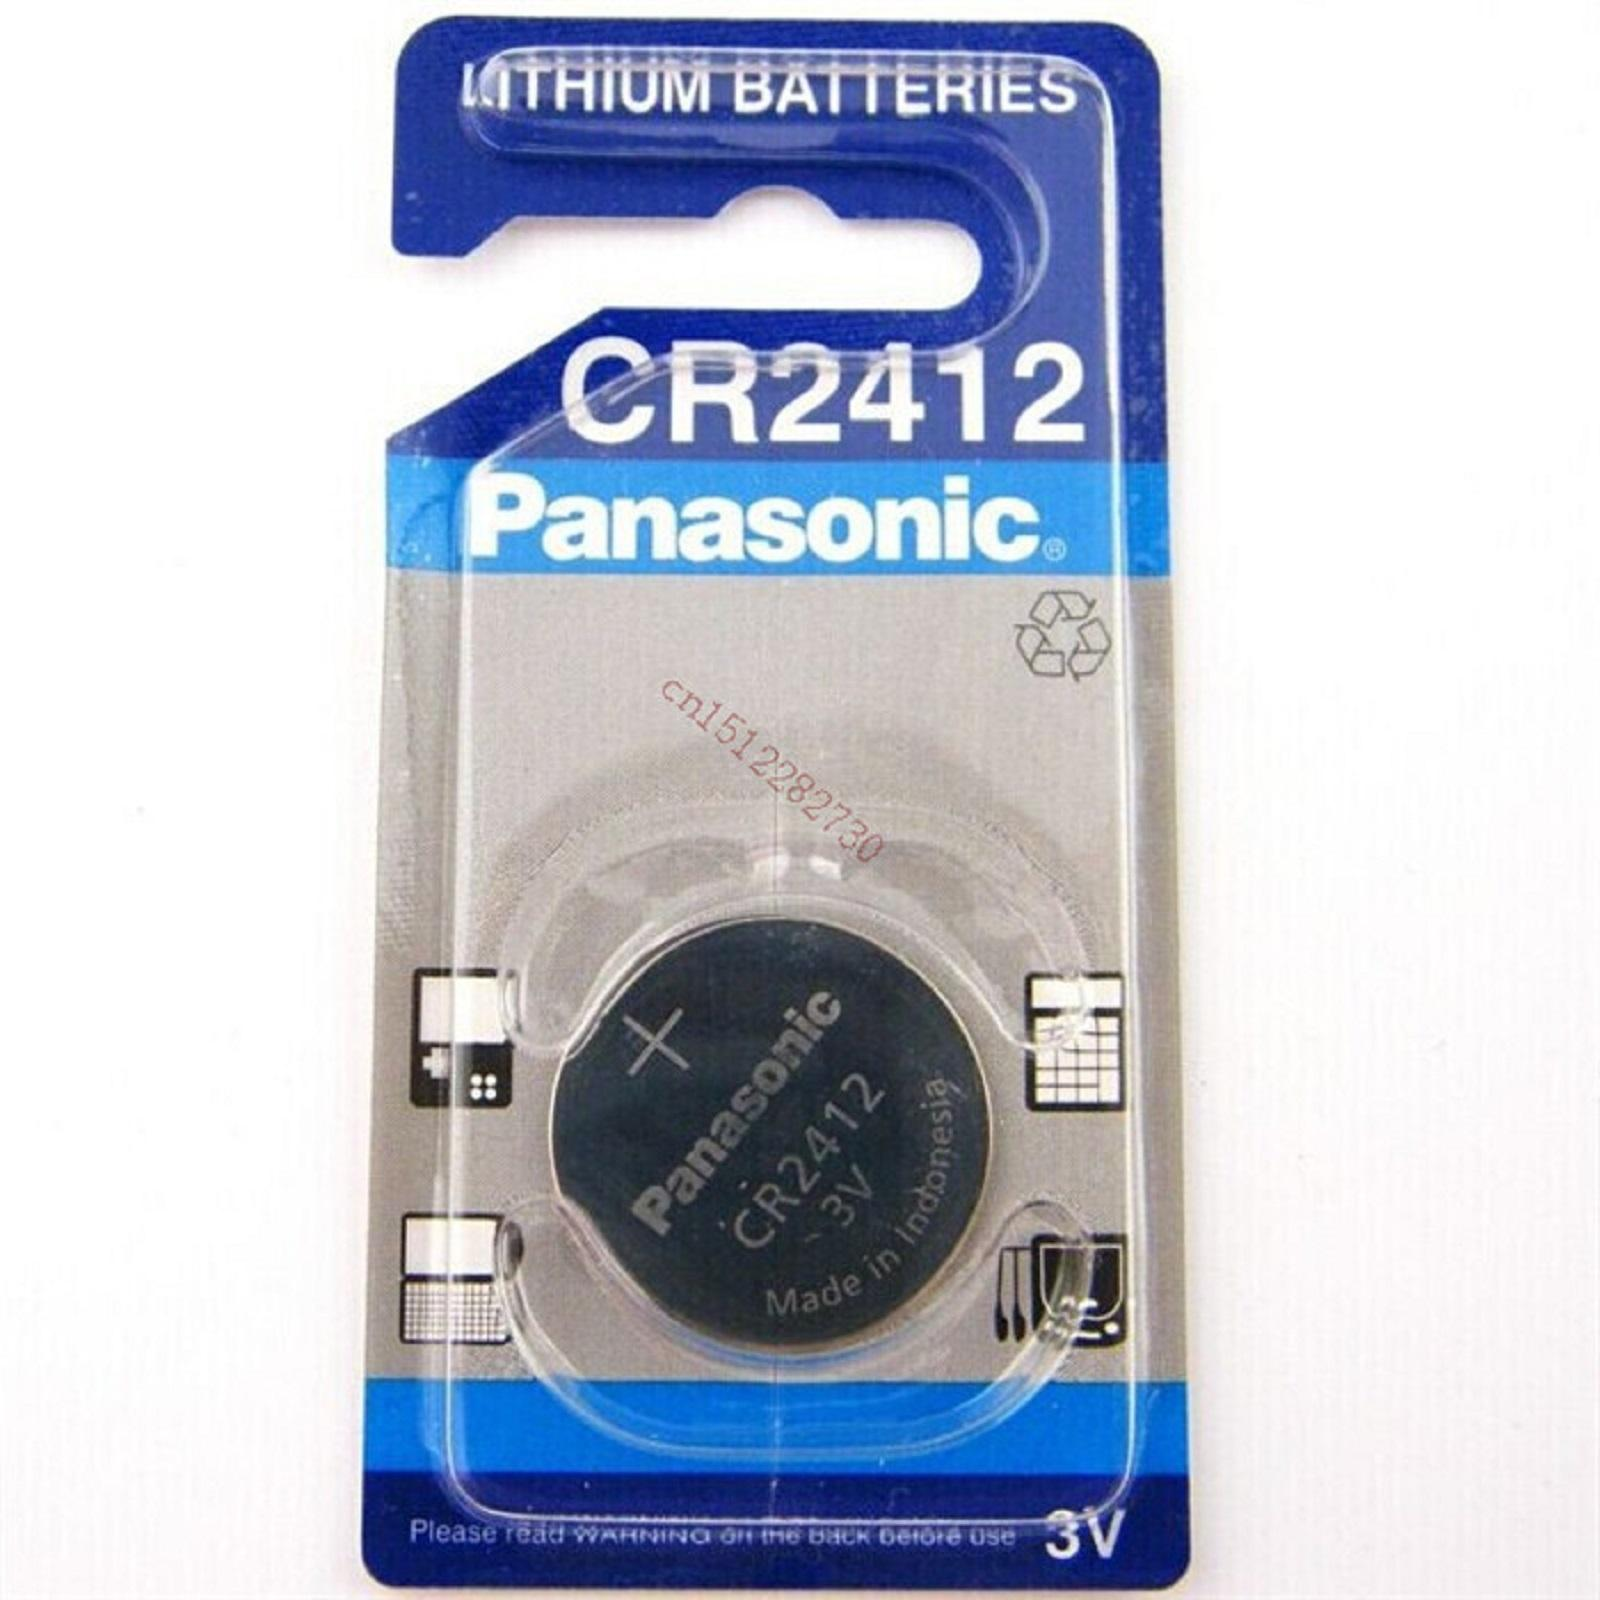 Pilas de boton Panasonic bateria original plaio CR2412 3 V en blister 5X Unidades